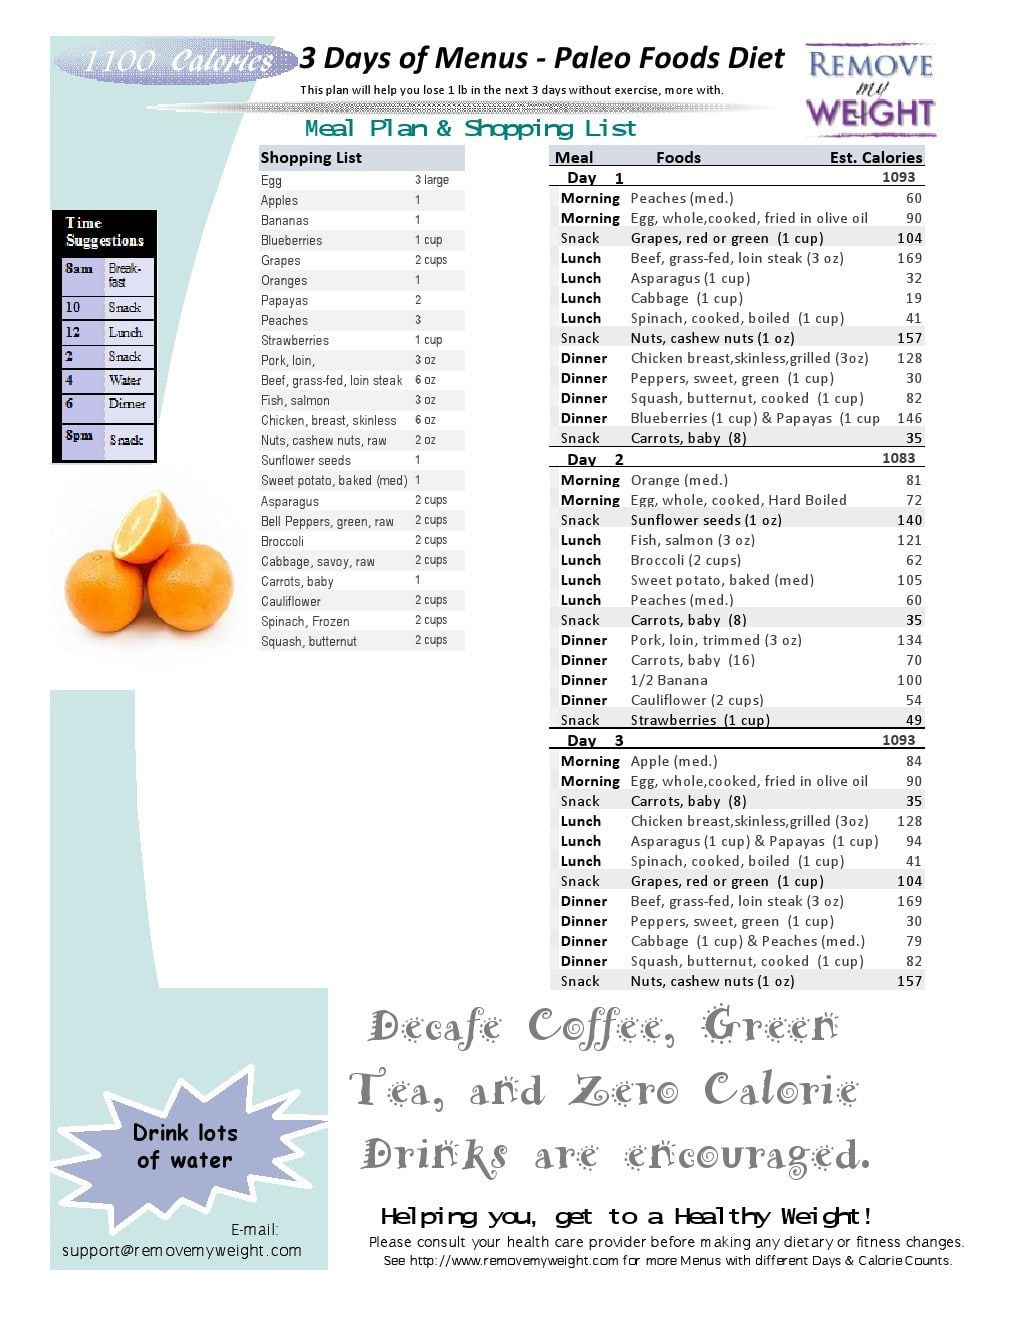 1100 calorie a day diet plan